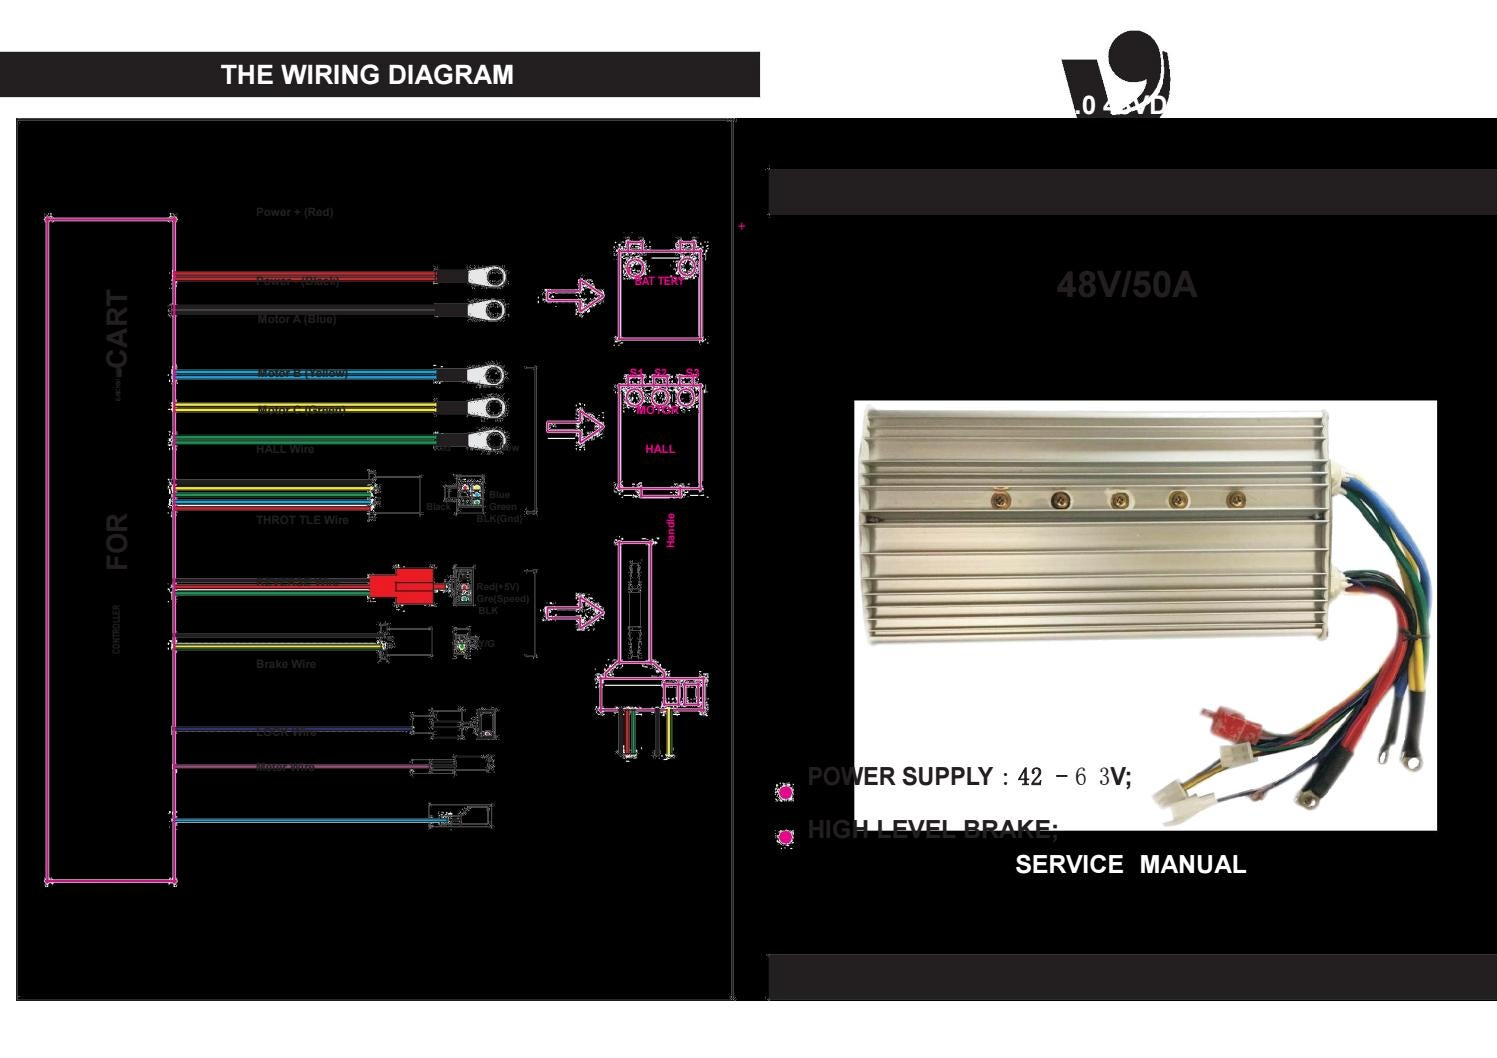 hight resolution of  auto rickshaw wiring diagram on airport diagram solar power diagram air compressor diagram